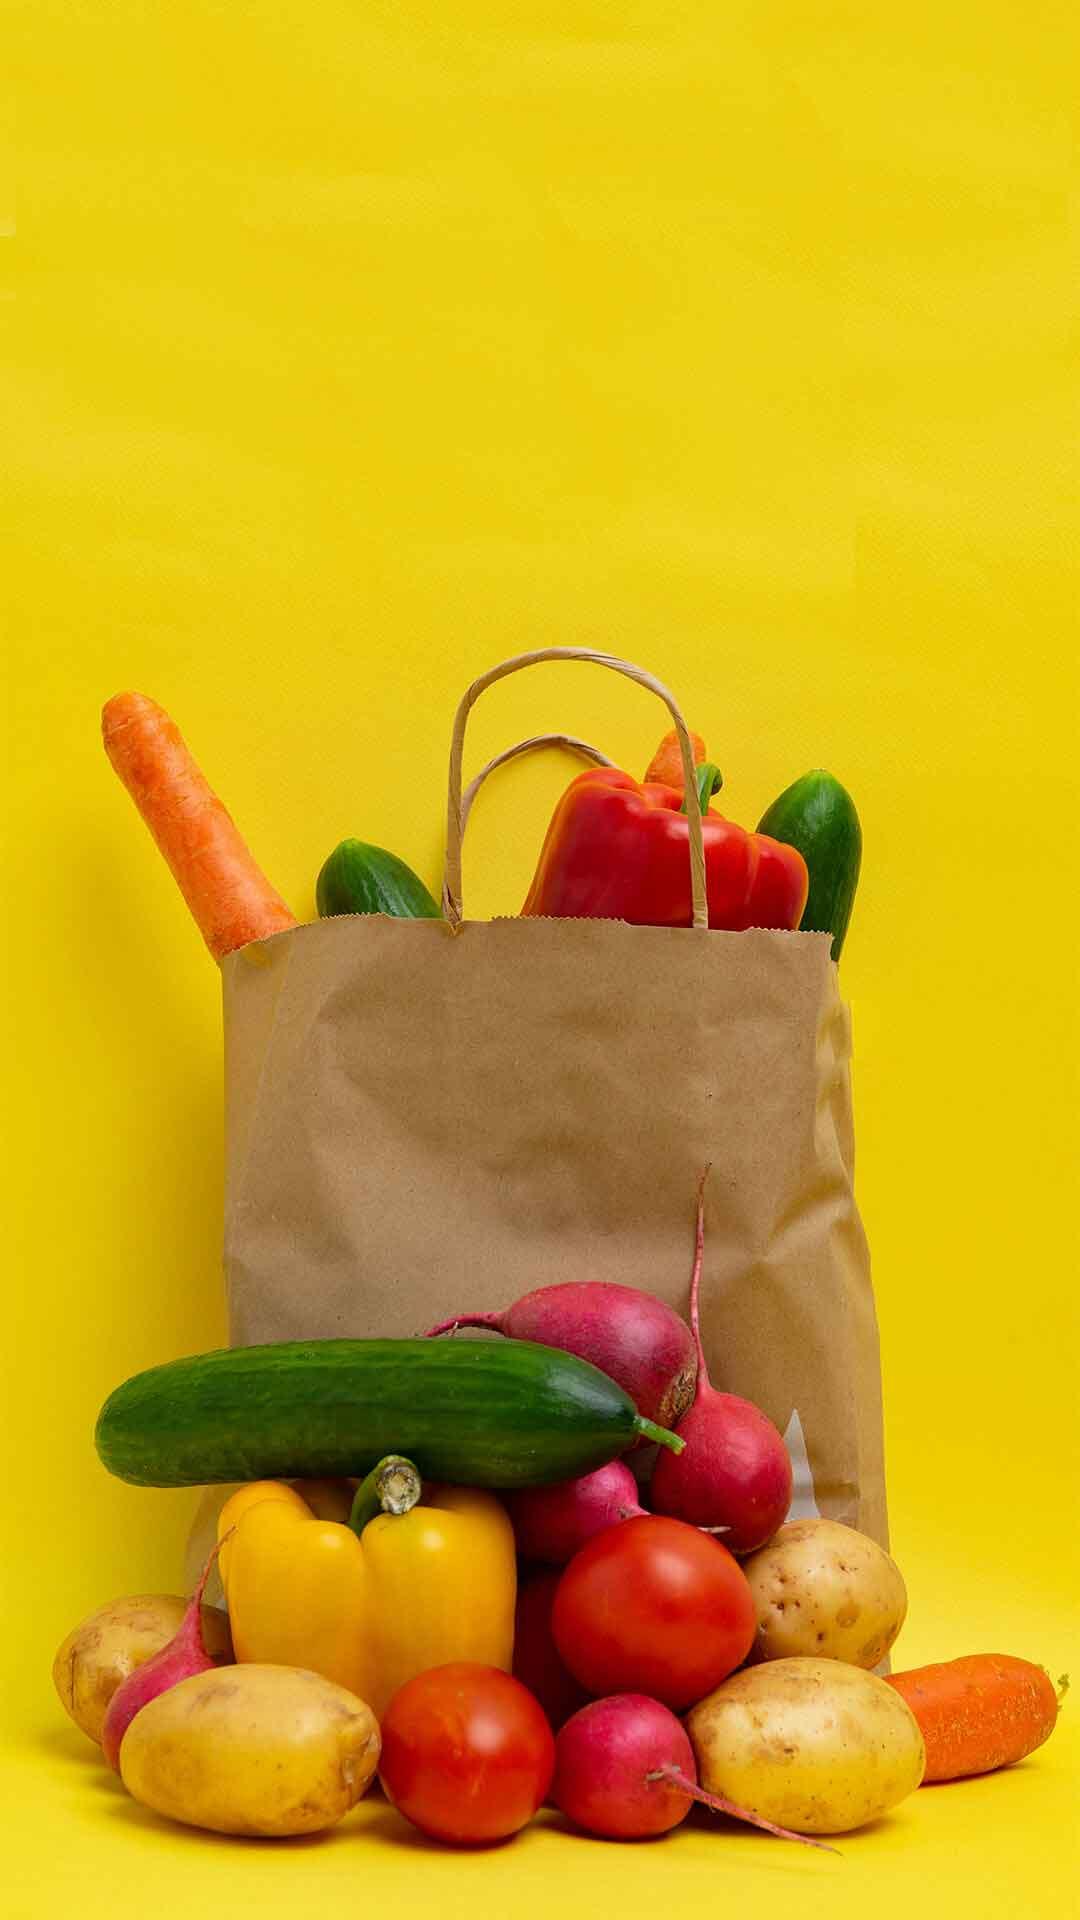 Top 5 healthy vegetables